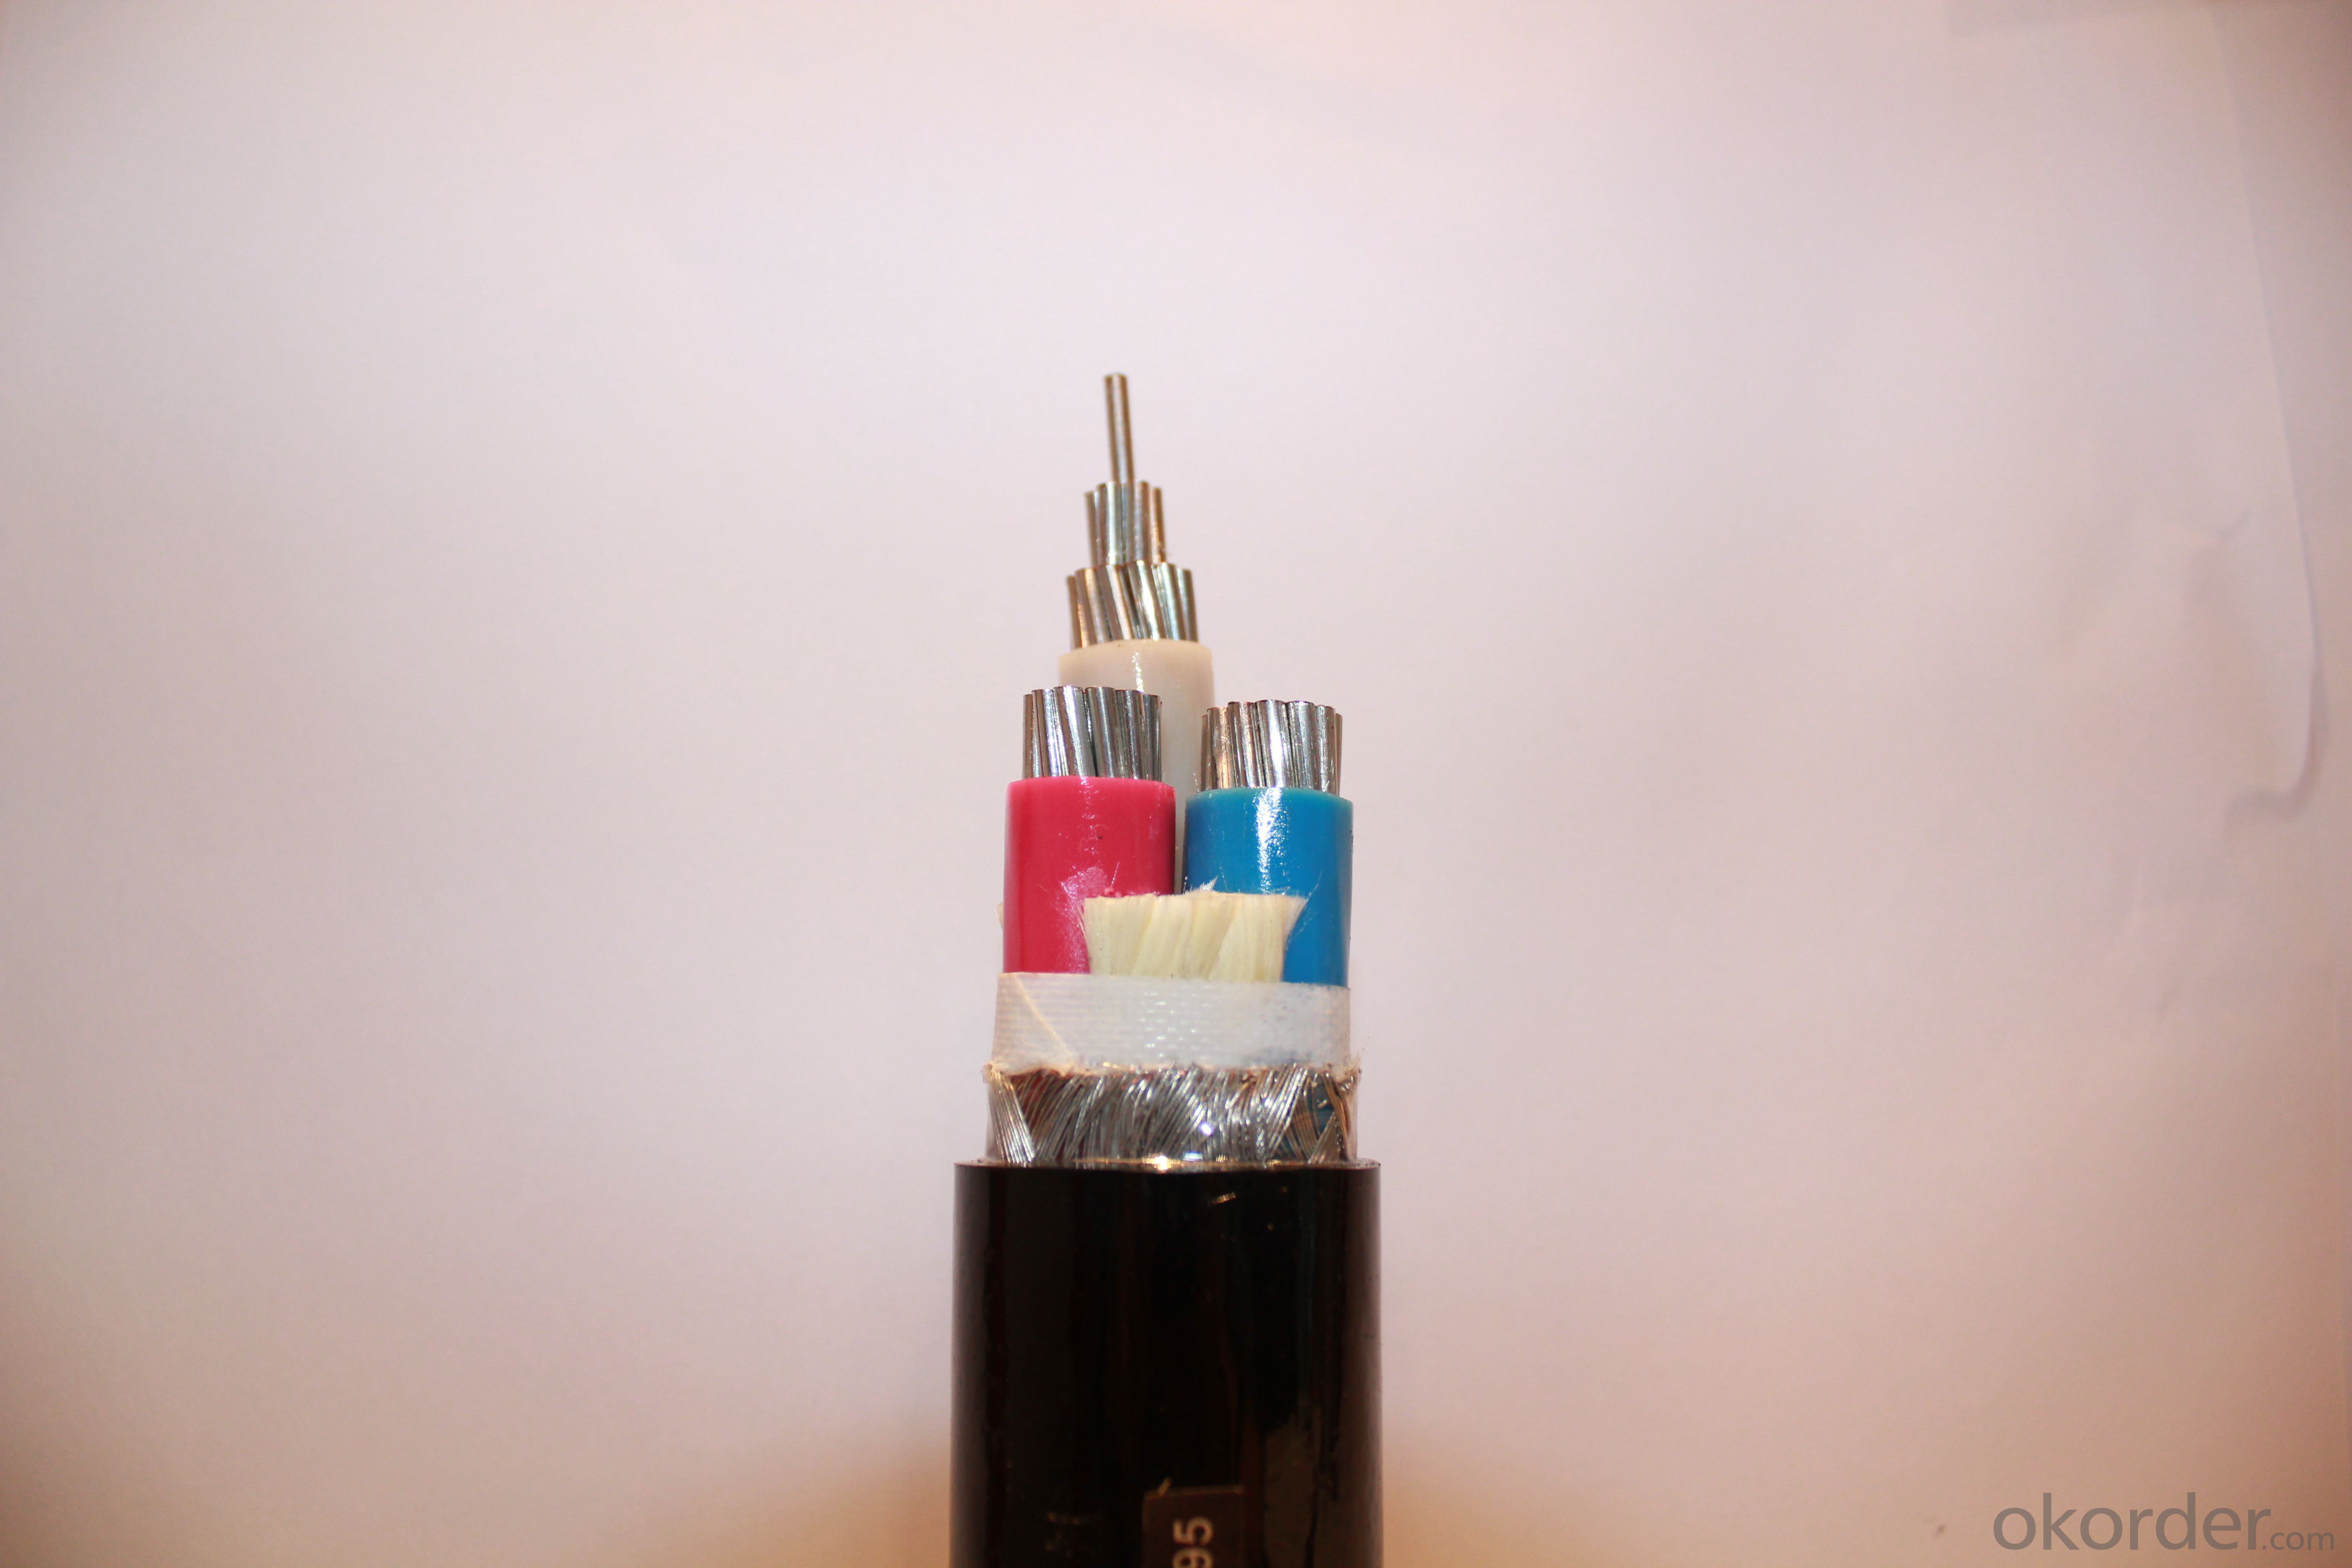 Shipboard power cable-CJ86 SC